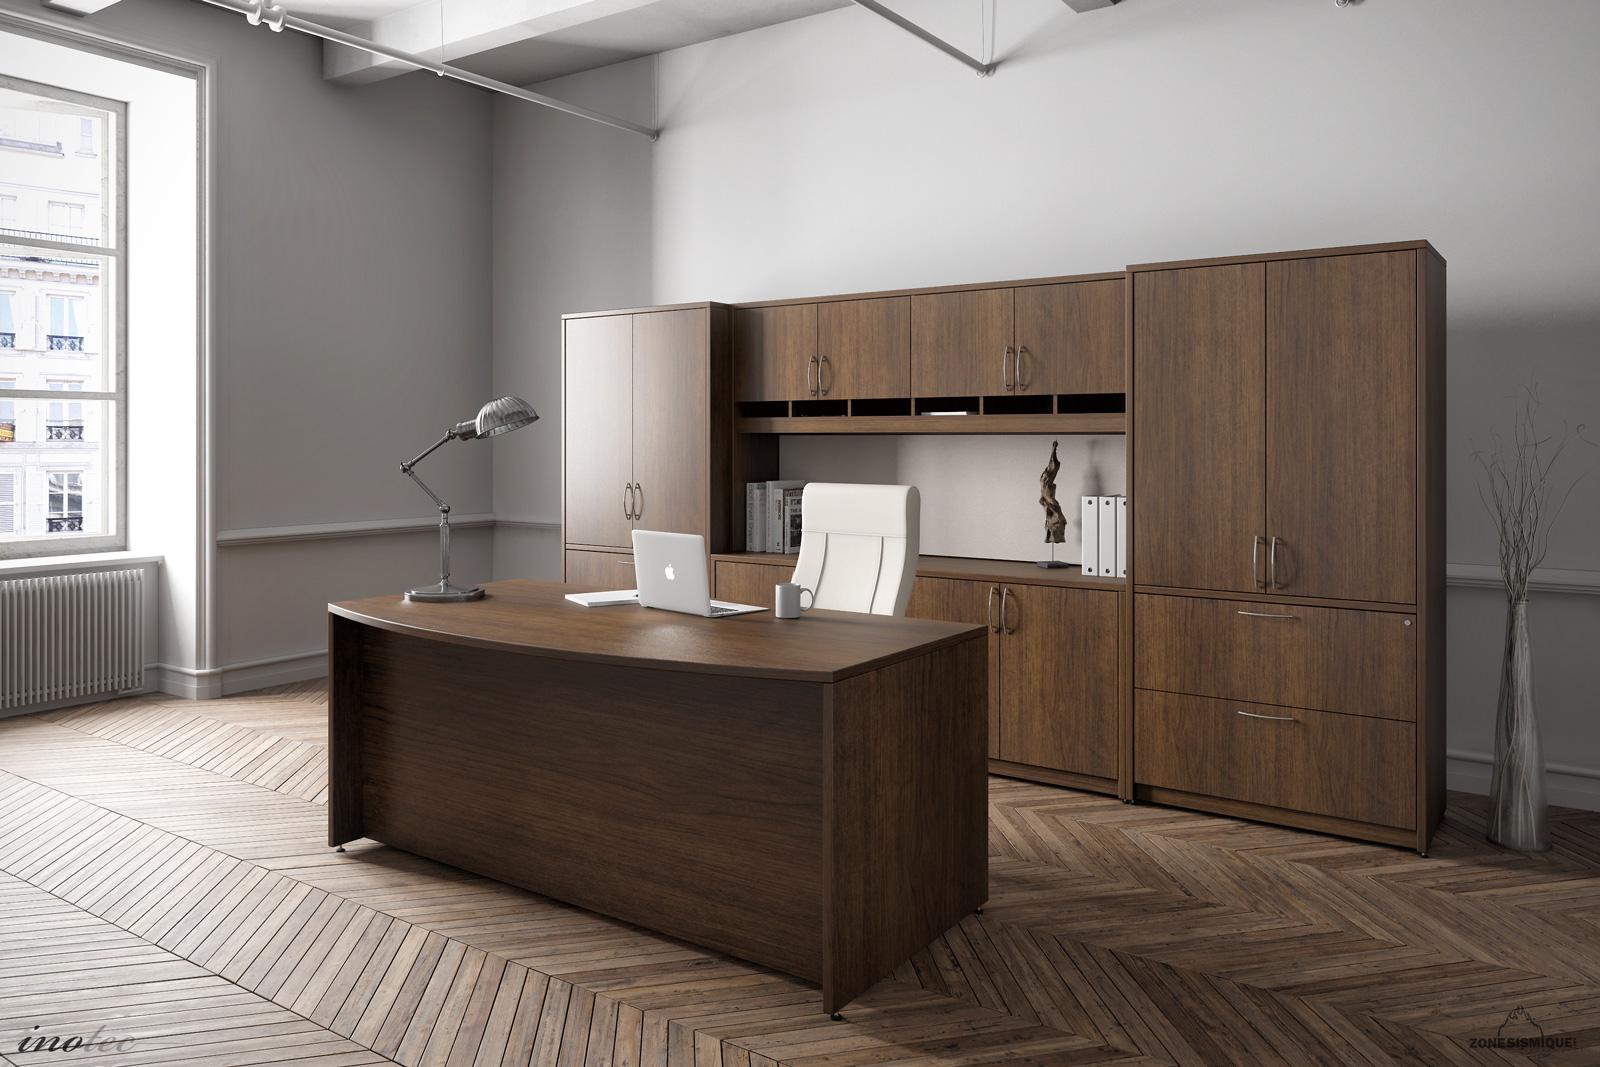 zone sismique inotec scene bureau 3d ypc 054 v1 zone. Black Bedroom Furniture Sets. Home Design Ideas